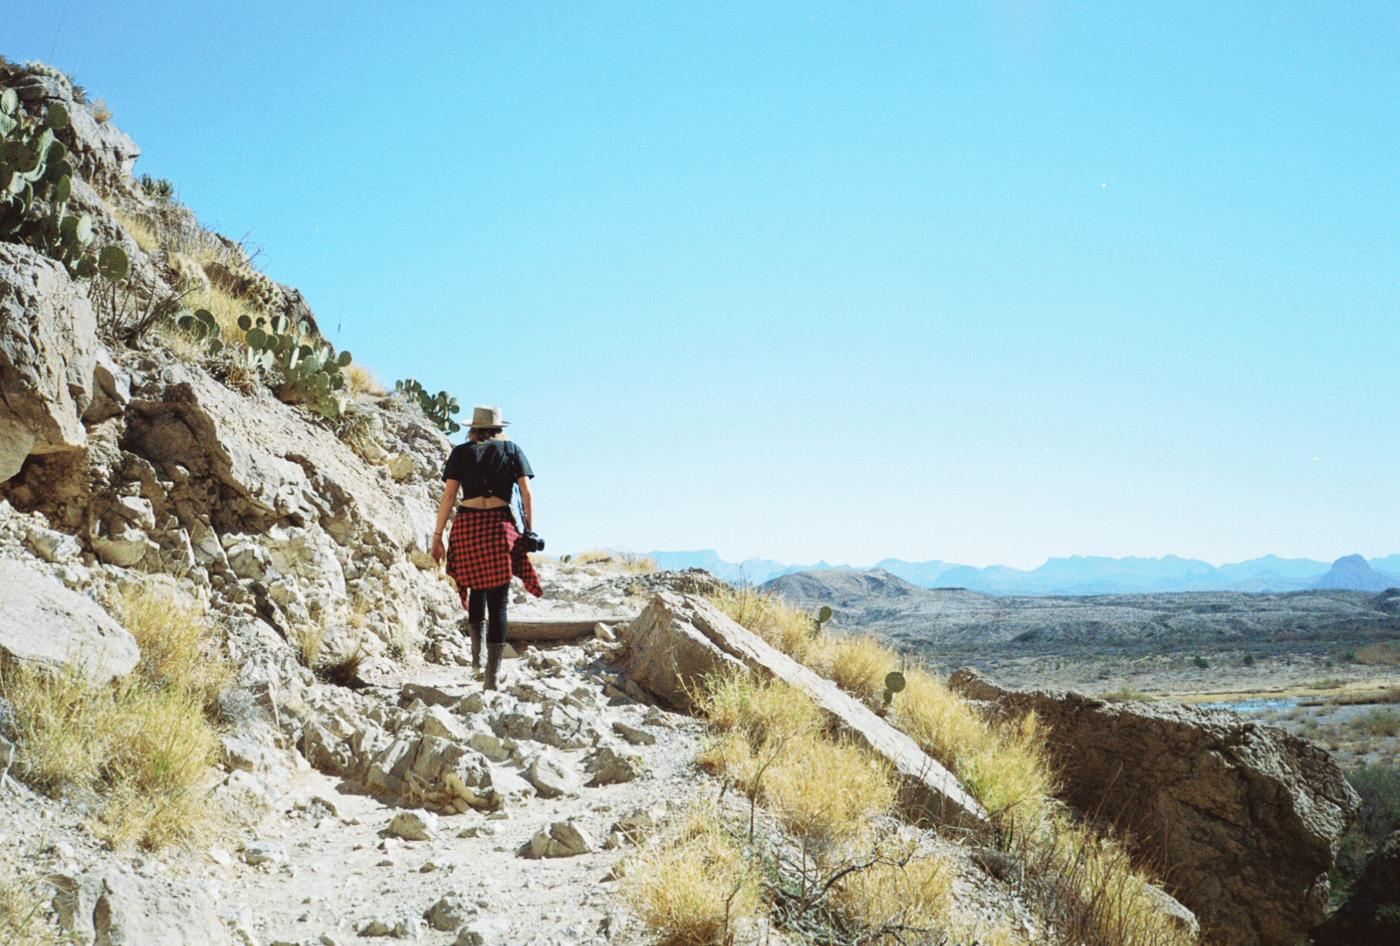 film 35mm lomo olympus hike camp big bend texas america yall pawlowski canyon